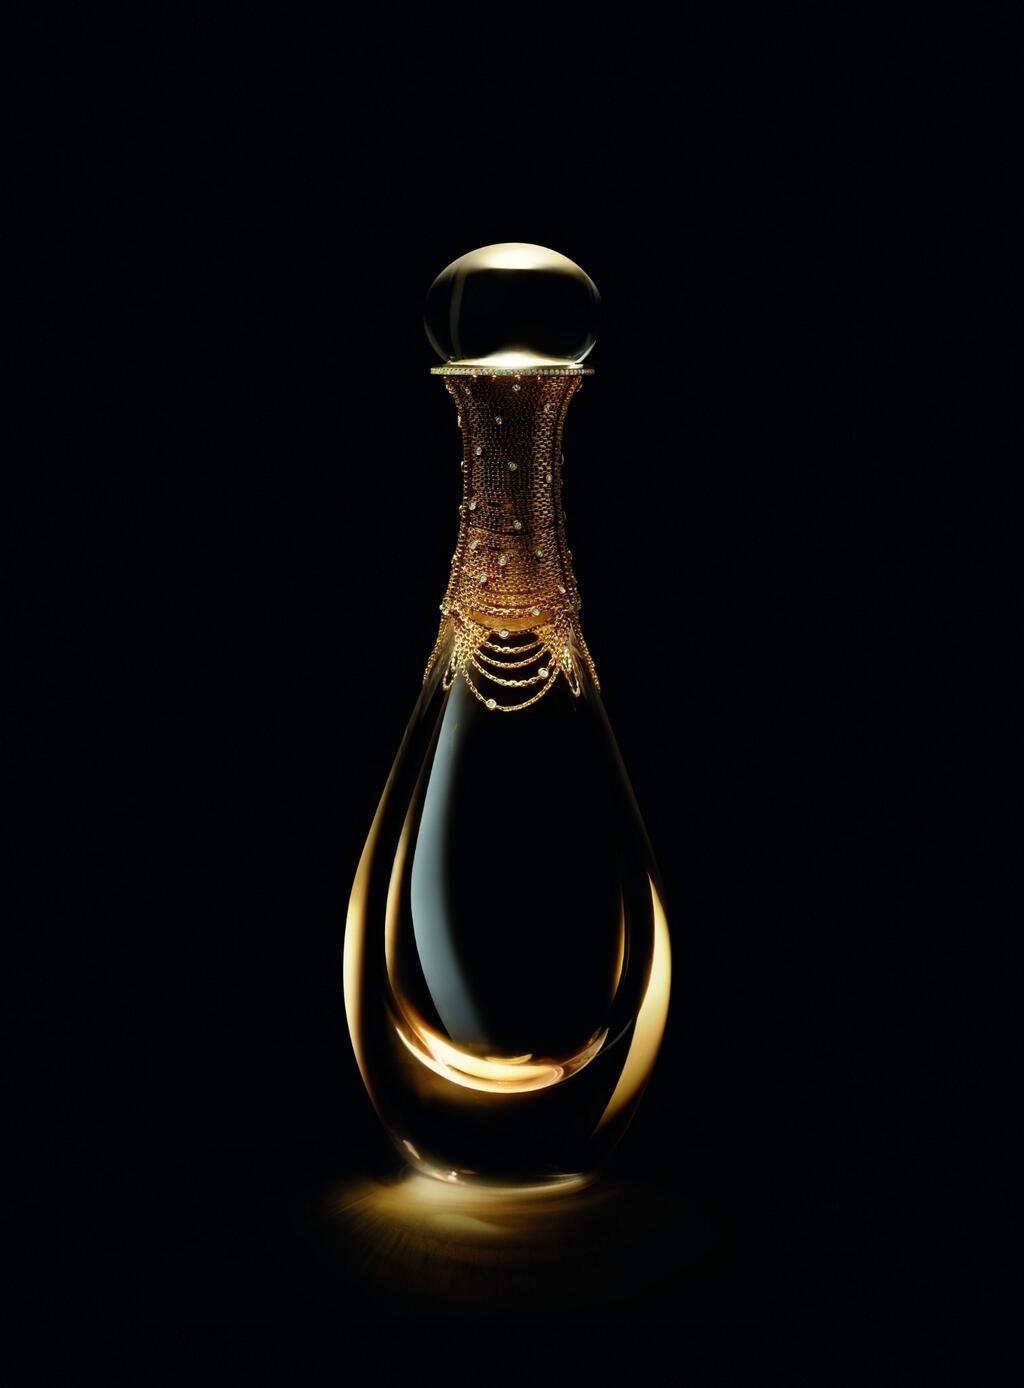 Dior On Packag Beautiful Perfume Black Gold Perfume Bottles